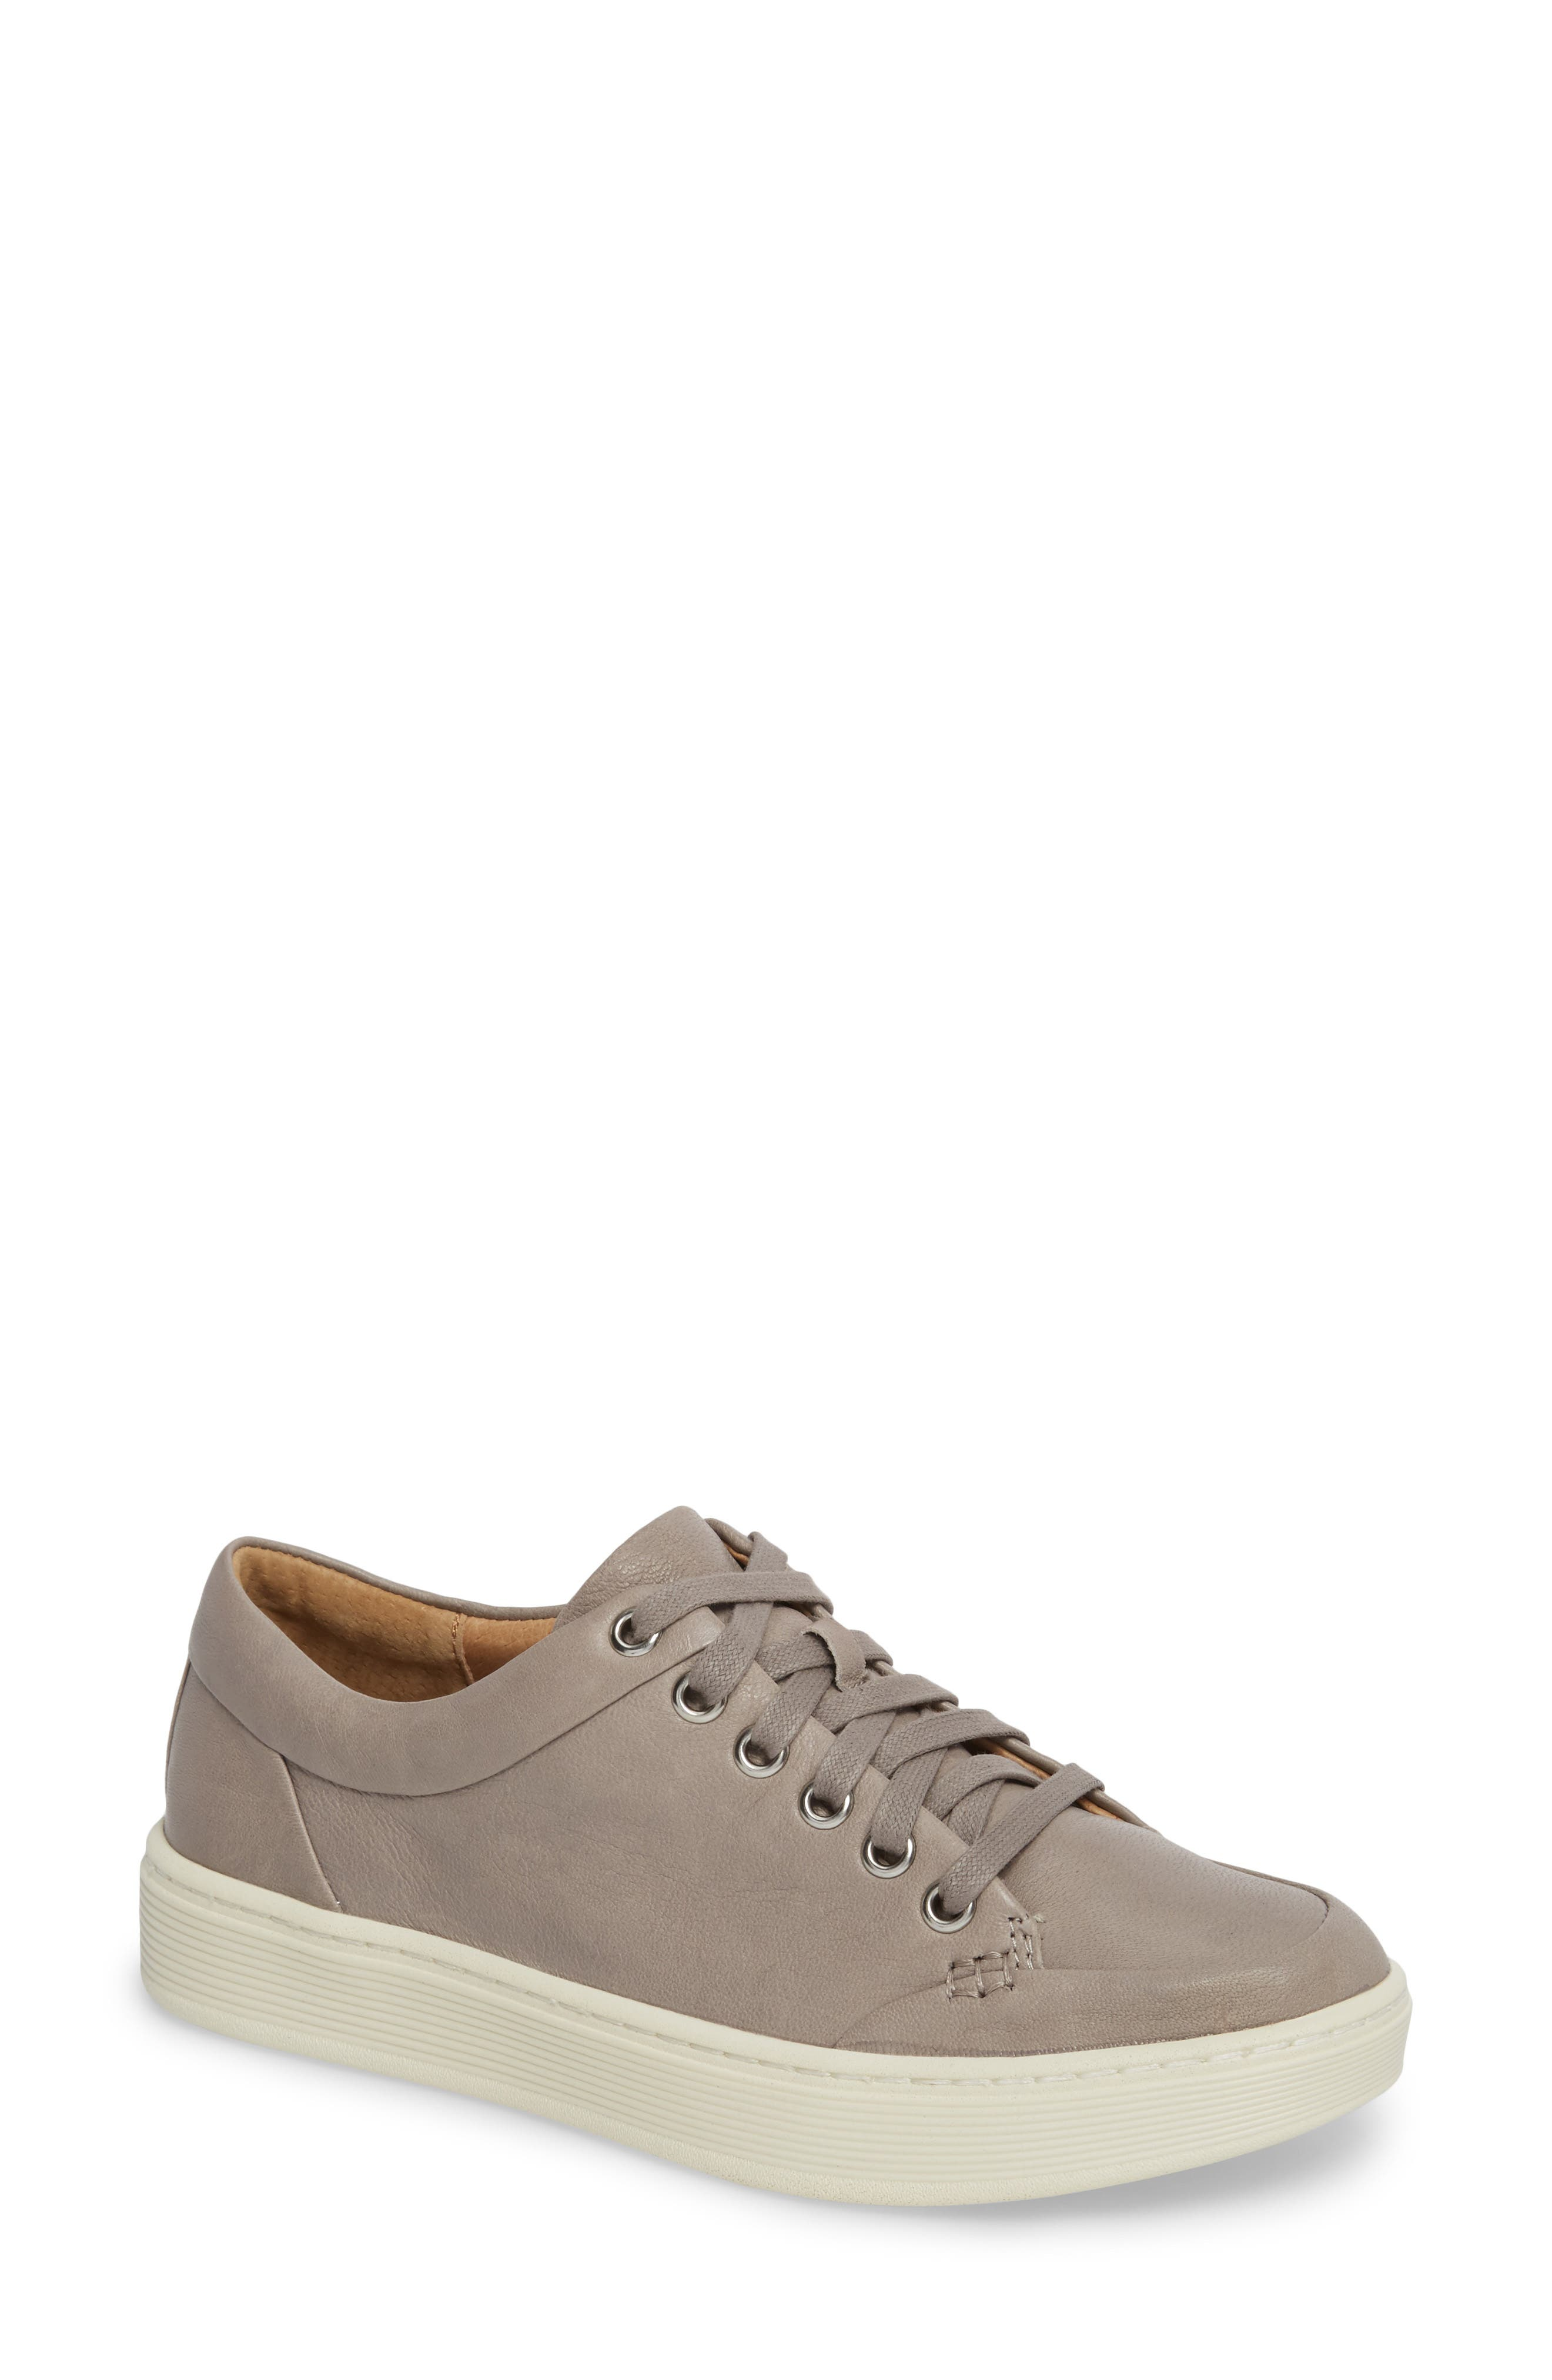 Sanders Sneaker,                         Main,                         color, ZINCO GREY LEATHER